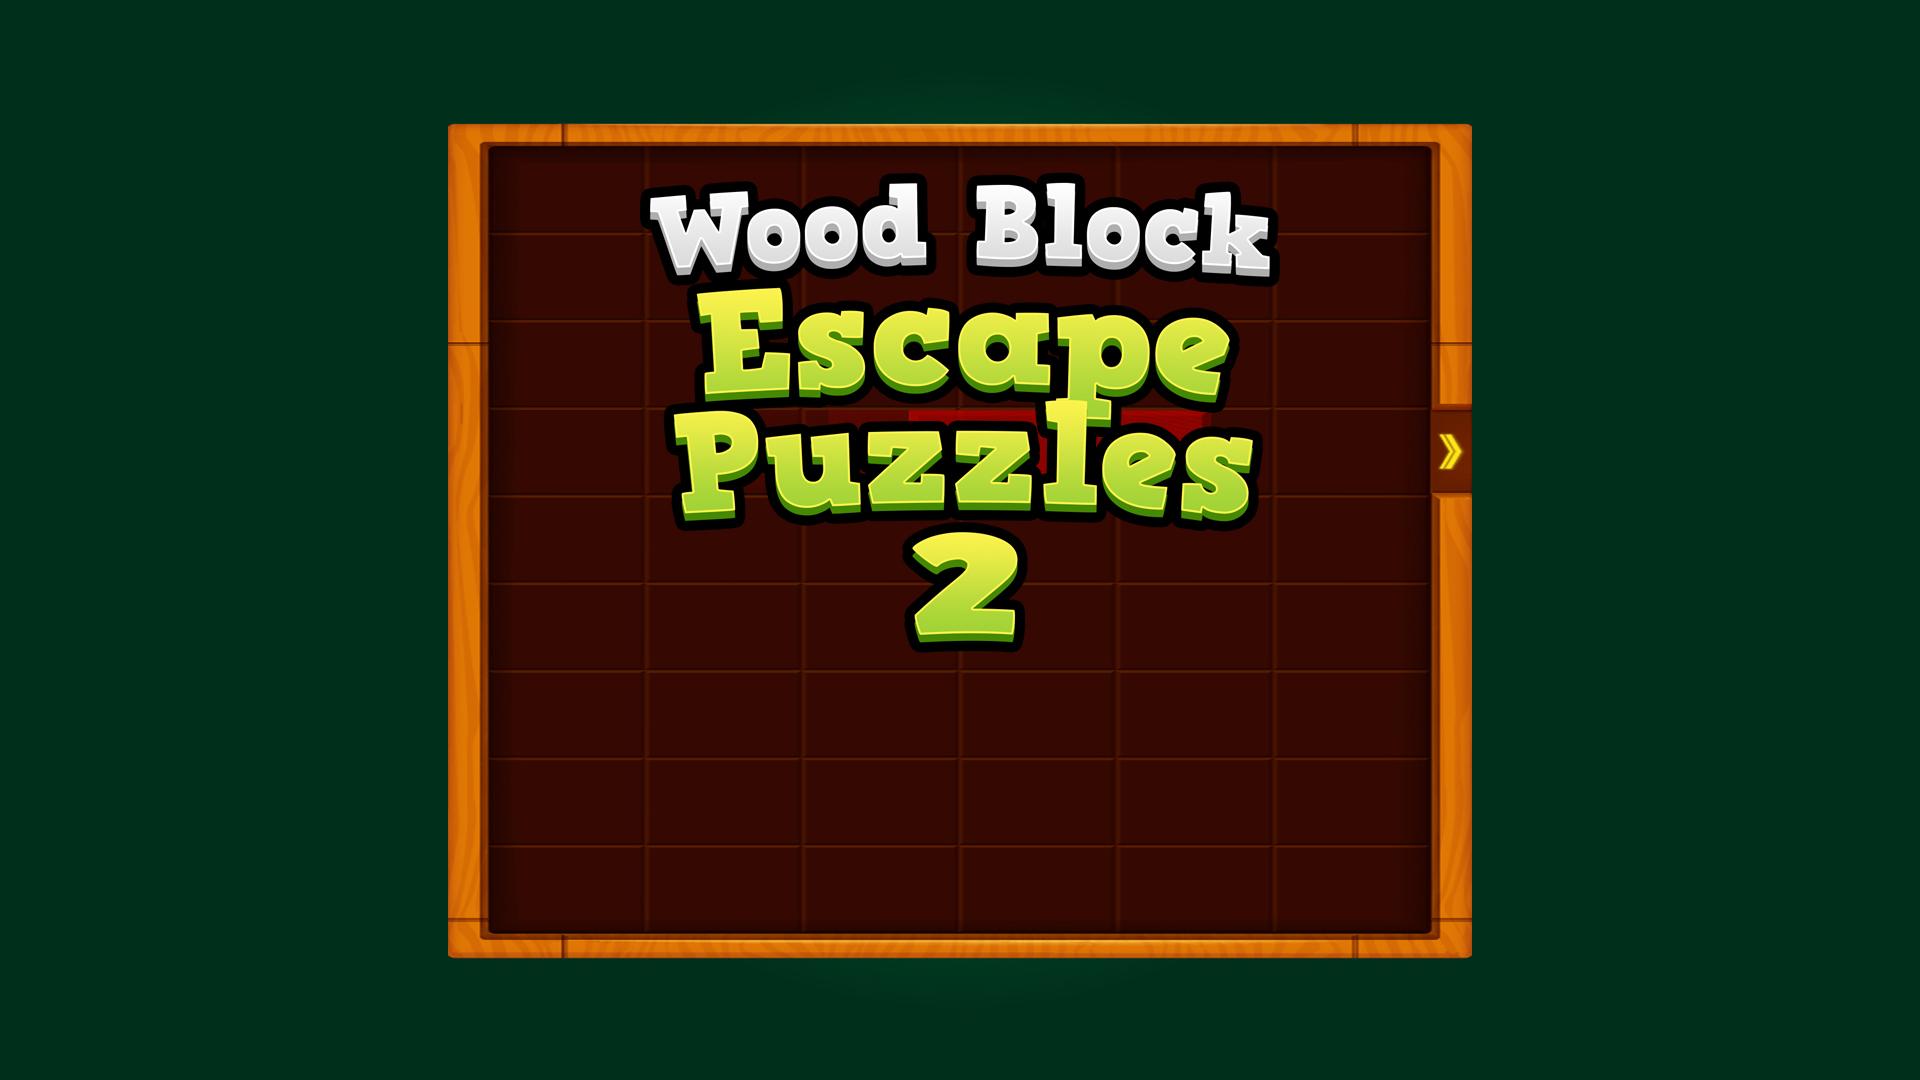 Wood Block Escape Puzzles 2